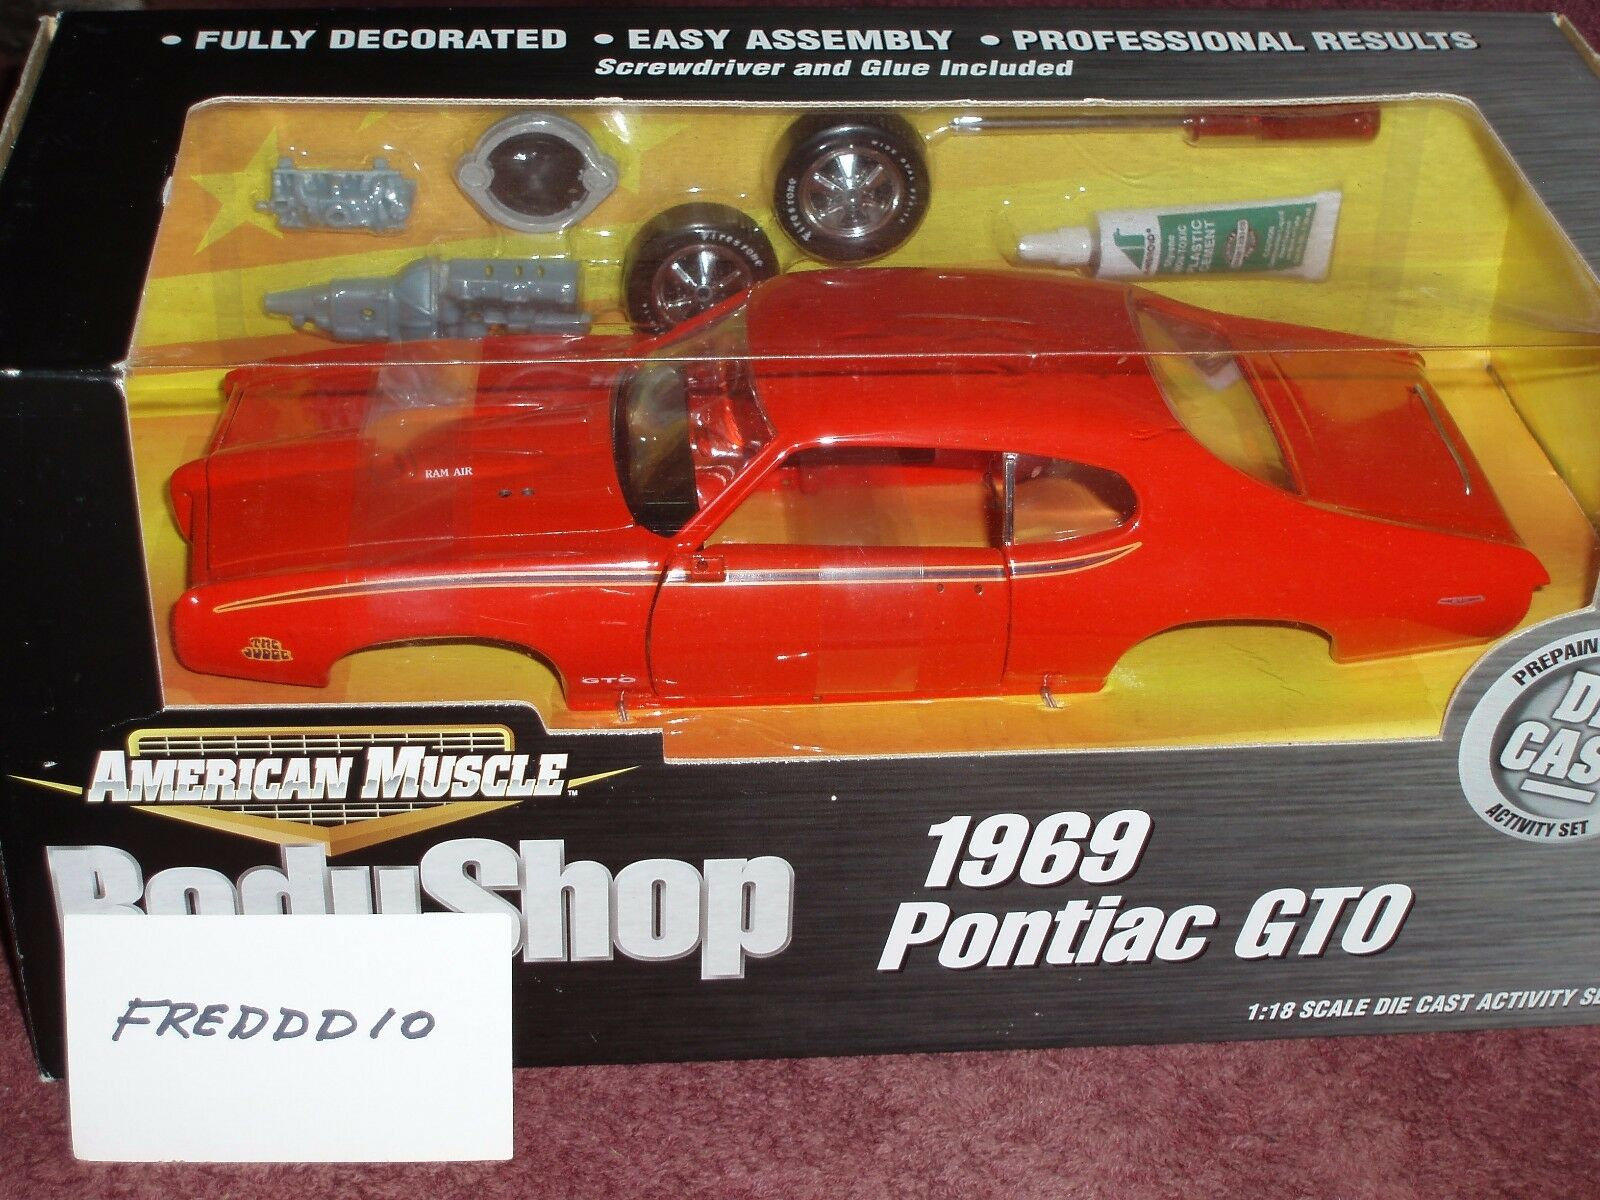 Ertl 1969 Pontiac Gto  el juez  Body Shop Conjunto Modelo Kit 1 18 arancia